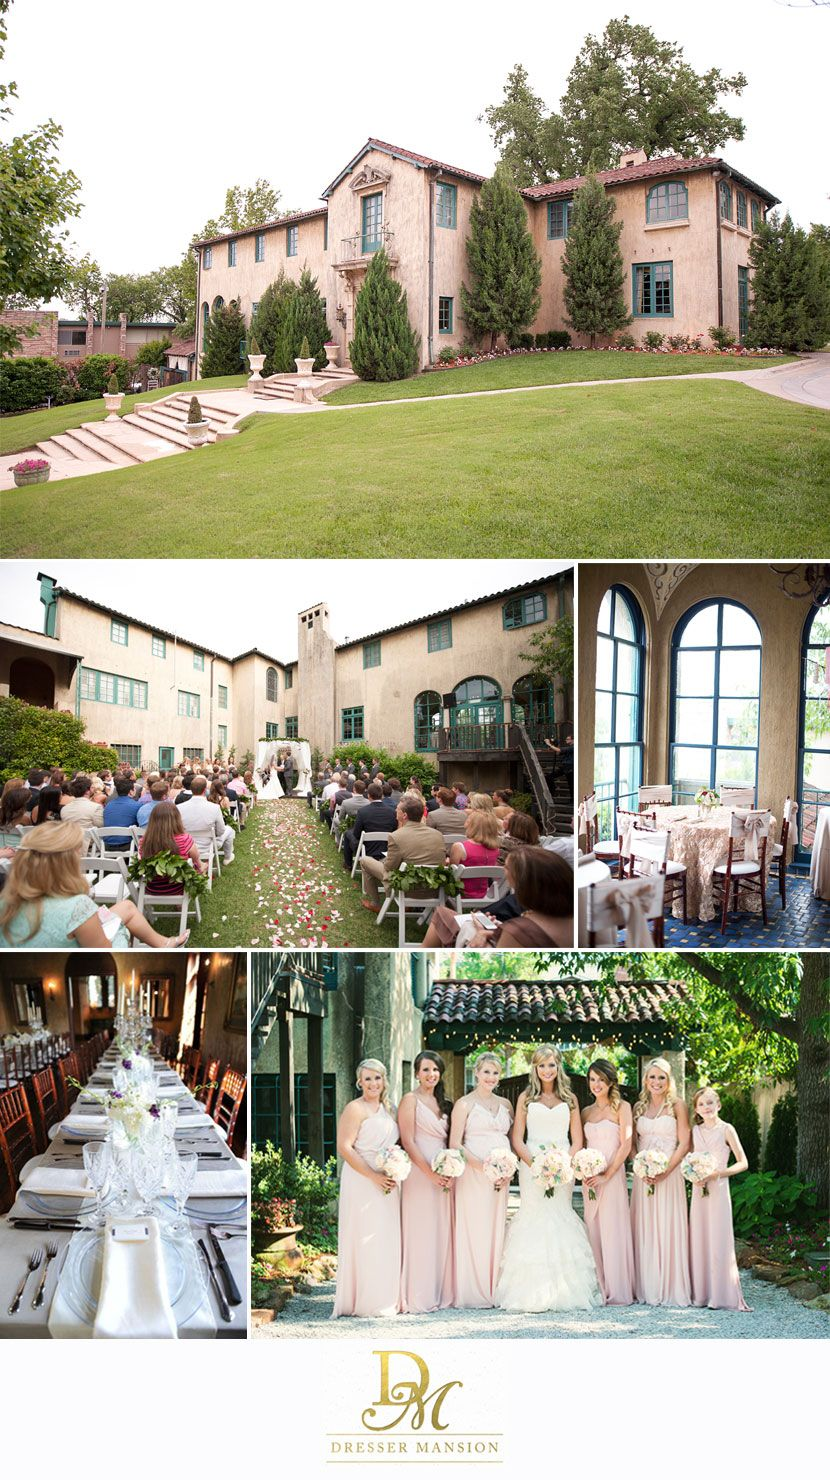 Dresser Mansion Tulsa Ok Oklahoma Wedding Venues Tulsa Wedding Venues Mansions